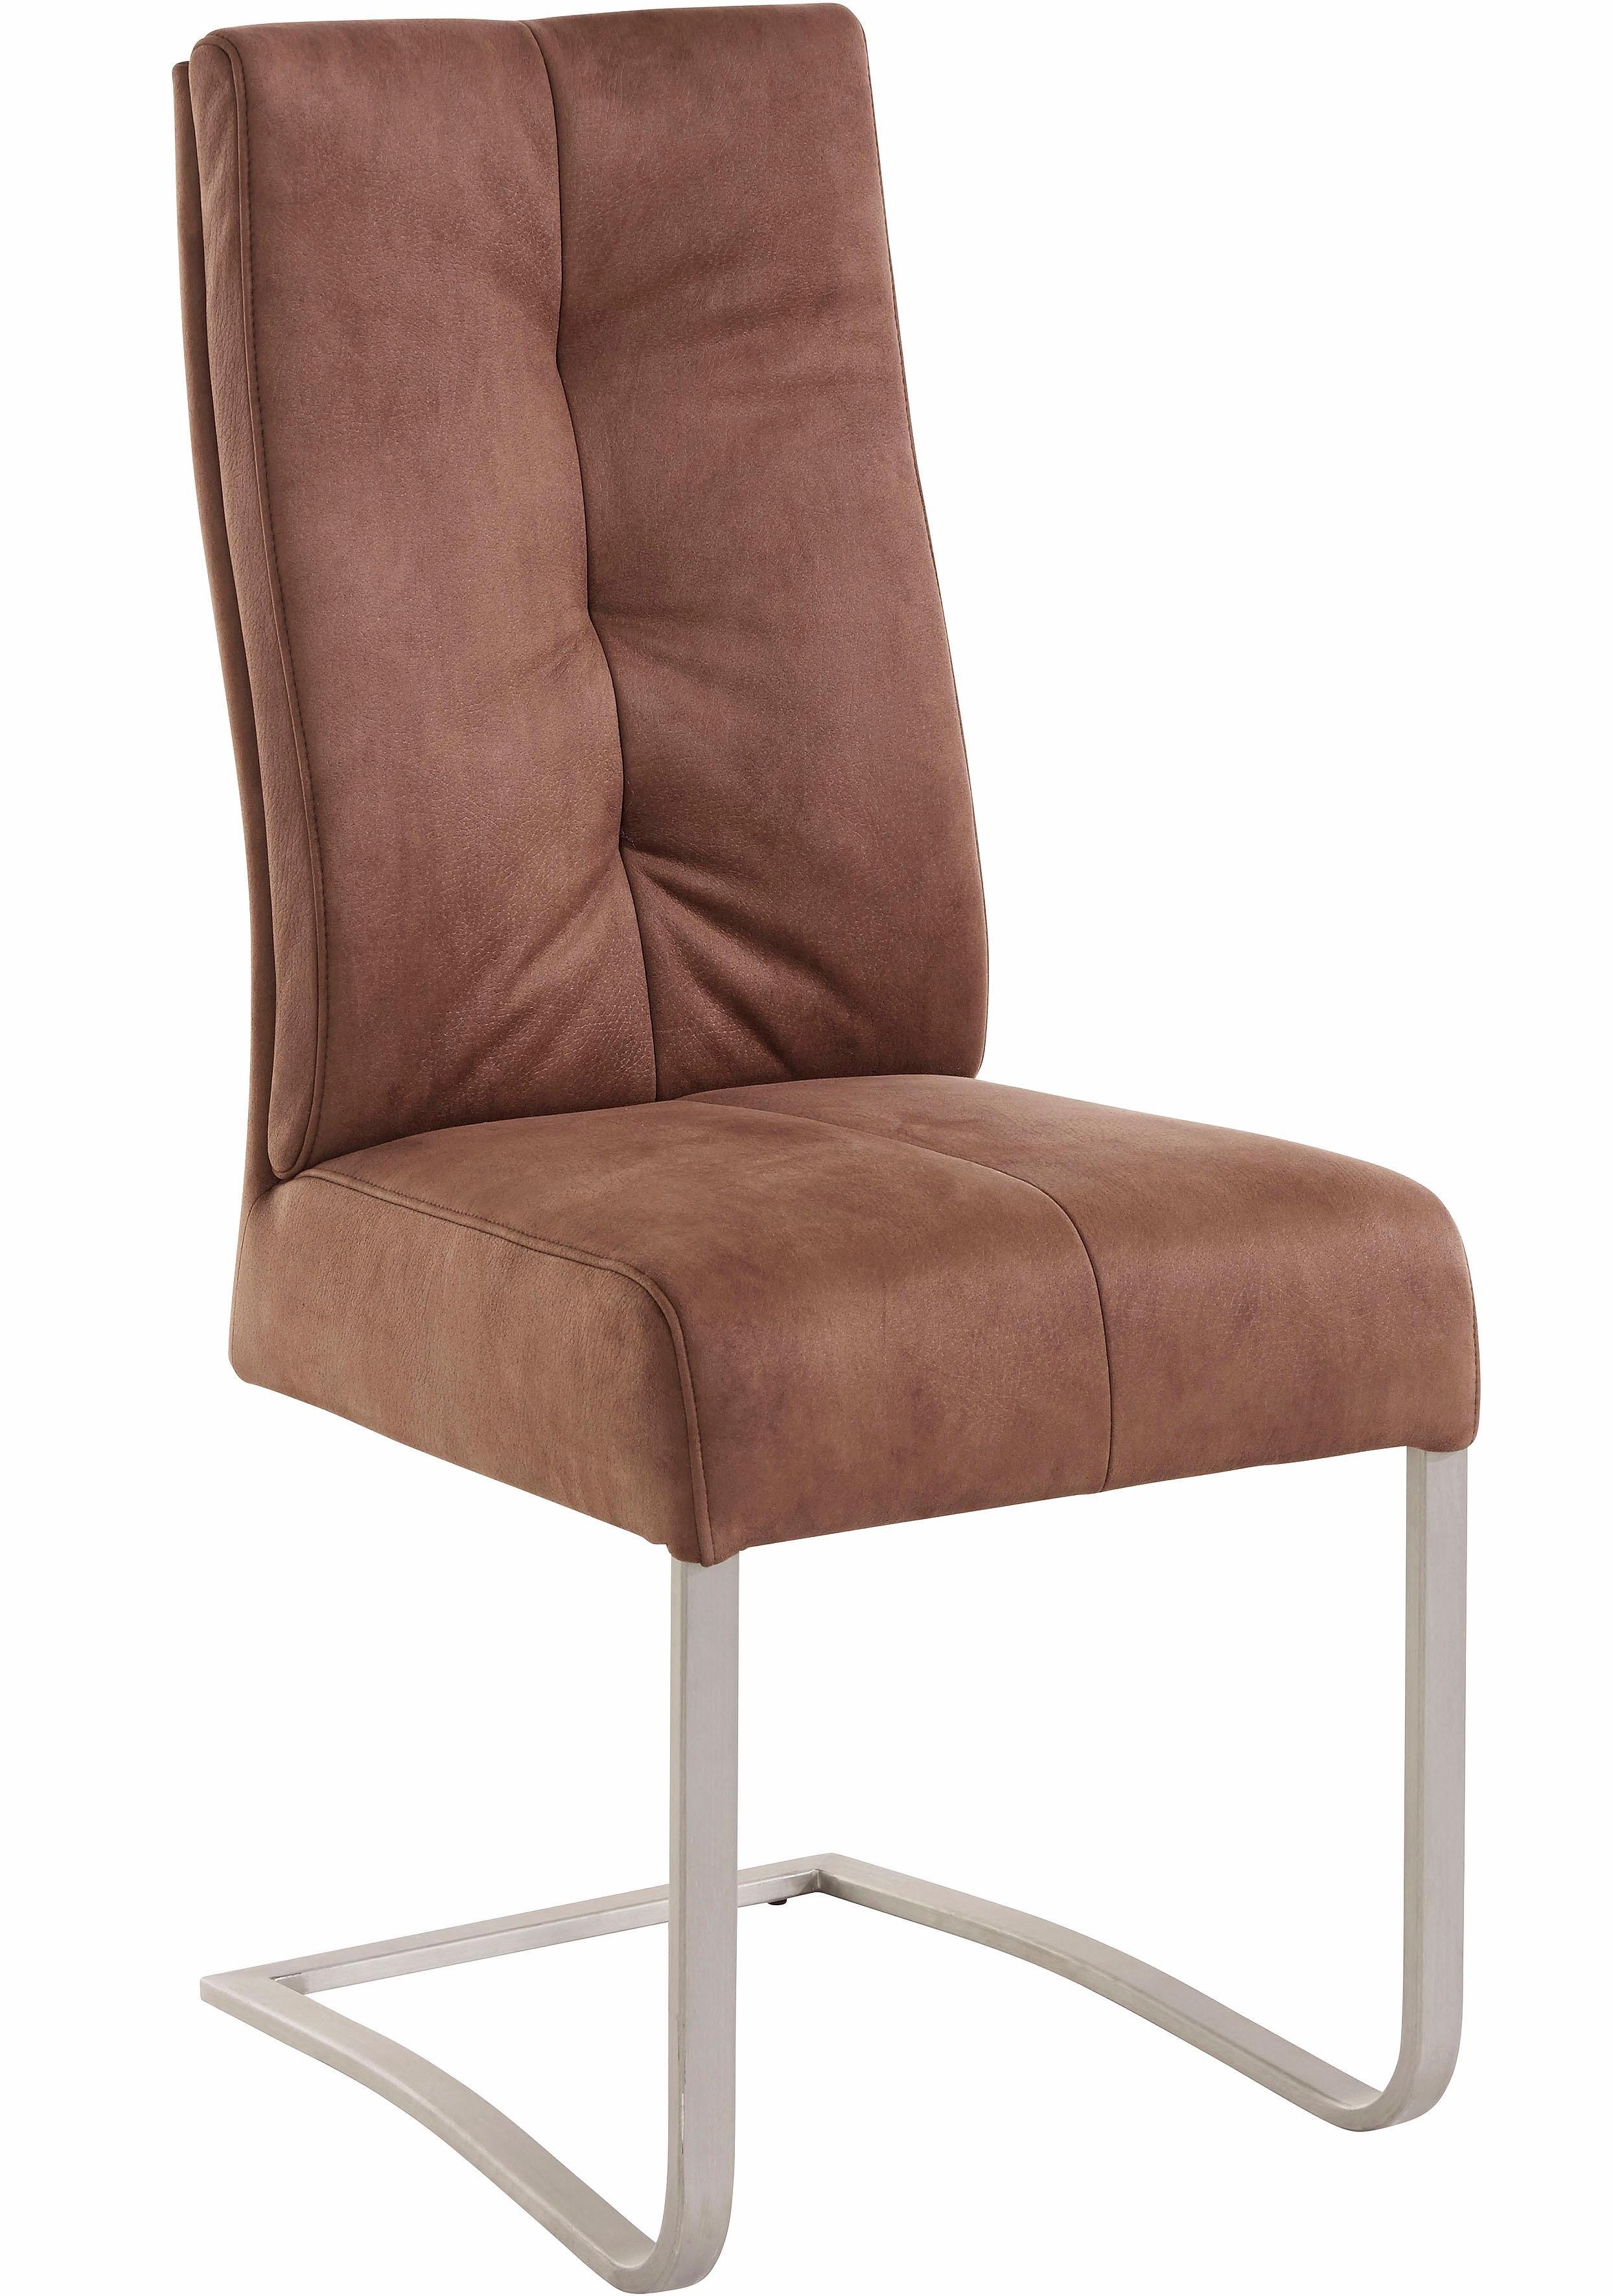 MCA furniture Eetkamerstoel Salva sledestoel 1 met pocketvering, belastbaar tot max. 120 kg (set, 2 stuks) voordelig en veilig online kopen